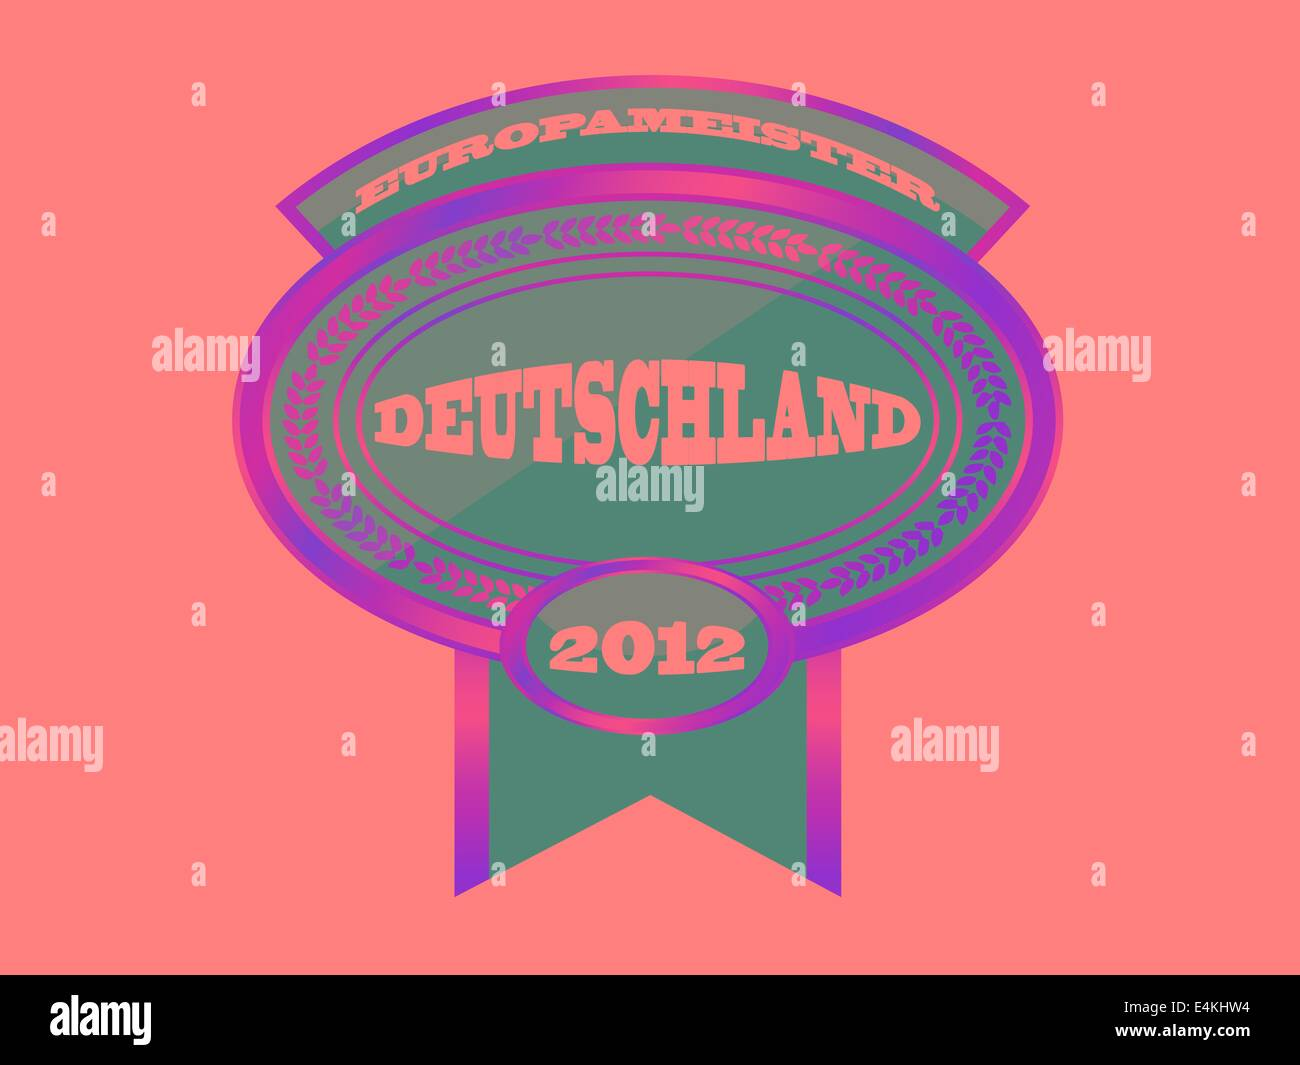 MEDAL - DEUTSCHLAND 2012 - Stock Image